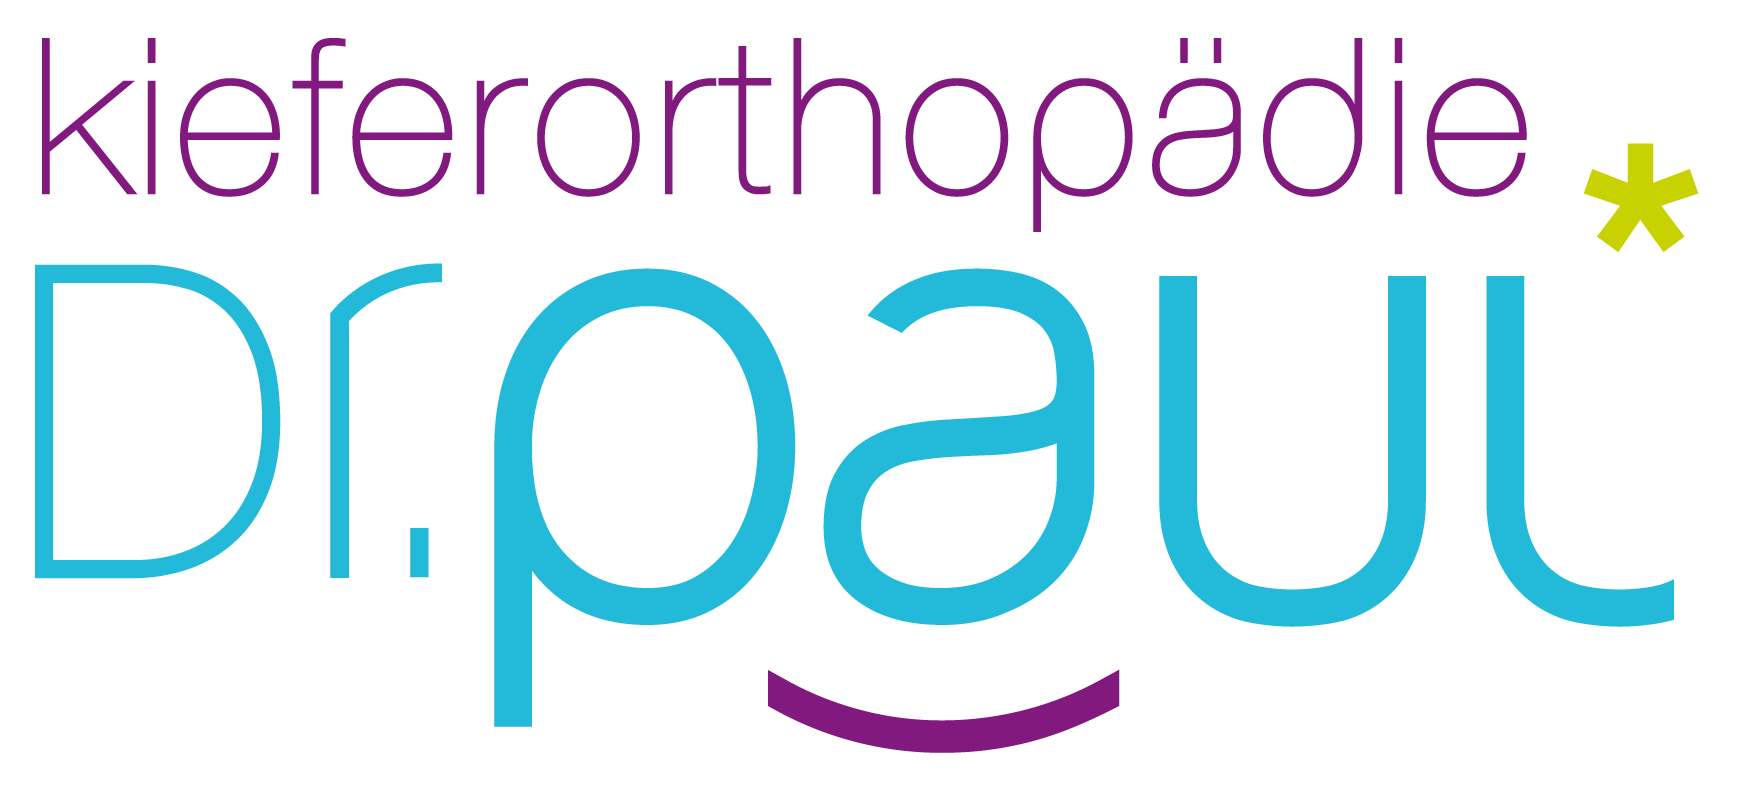 Dr. Paul - Kieferorthopädie in Münster-Hiltrup